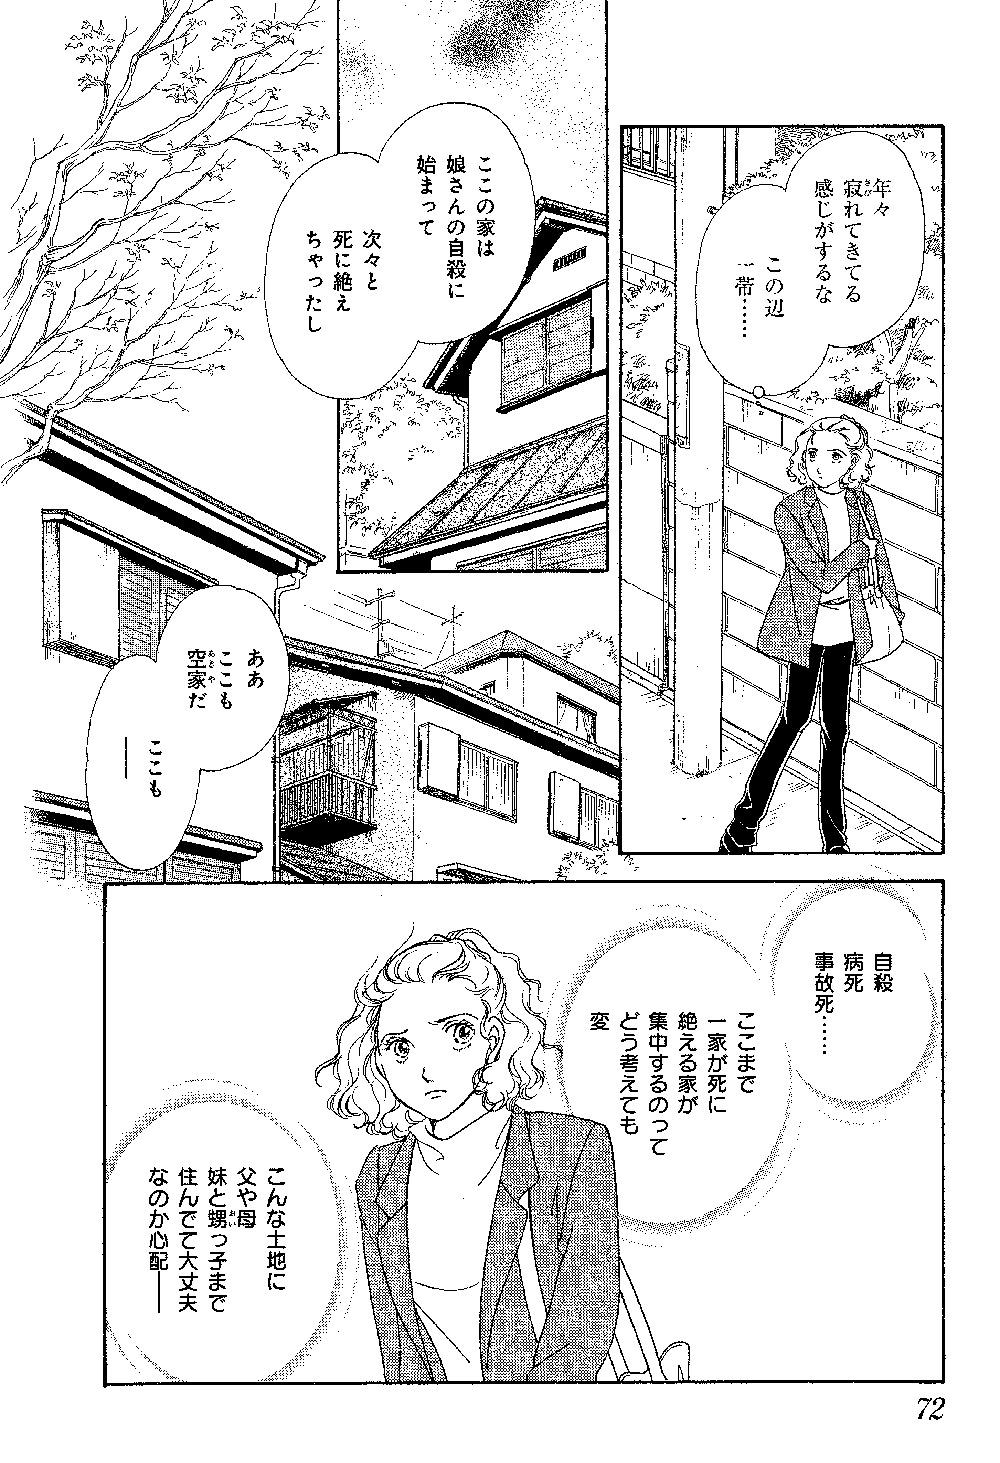 mayuri_0001_0072.jpg